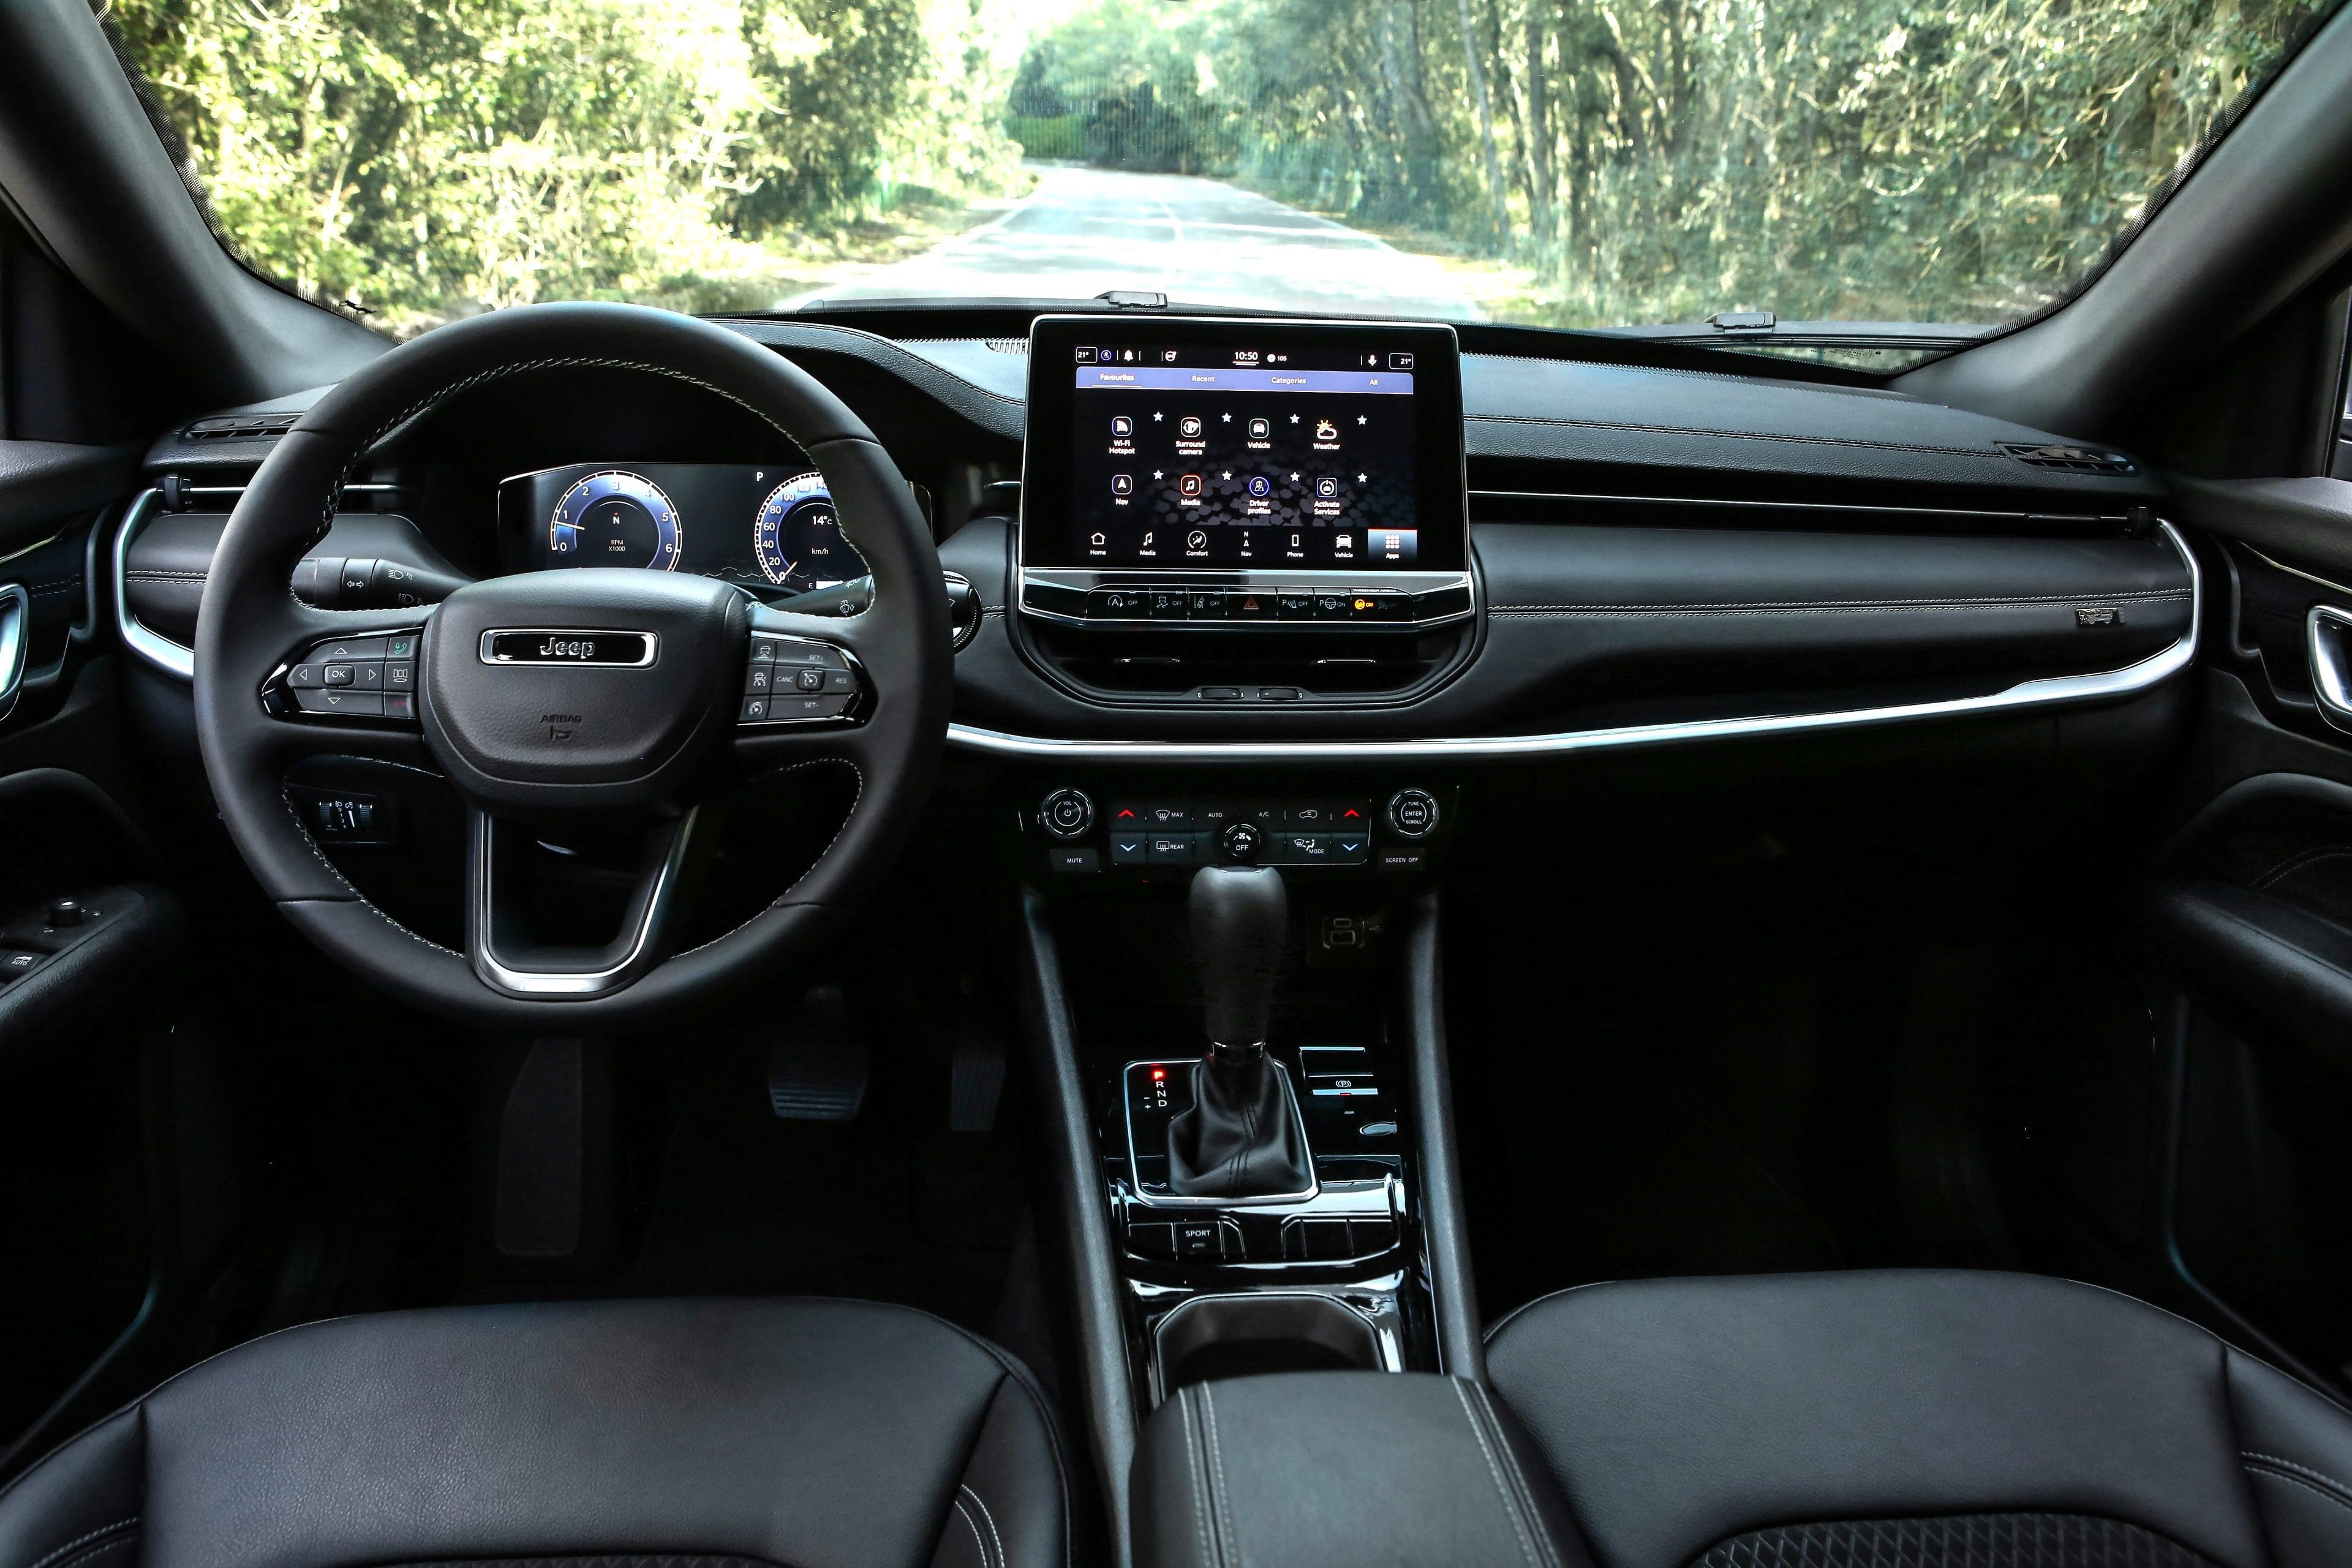 New Jeep Compass 80th Anniversary - overzicht nieuw dasboard